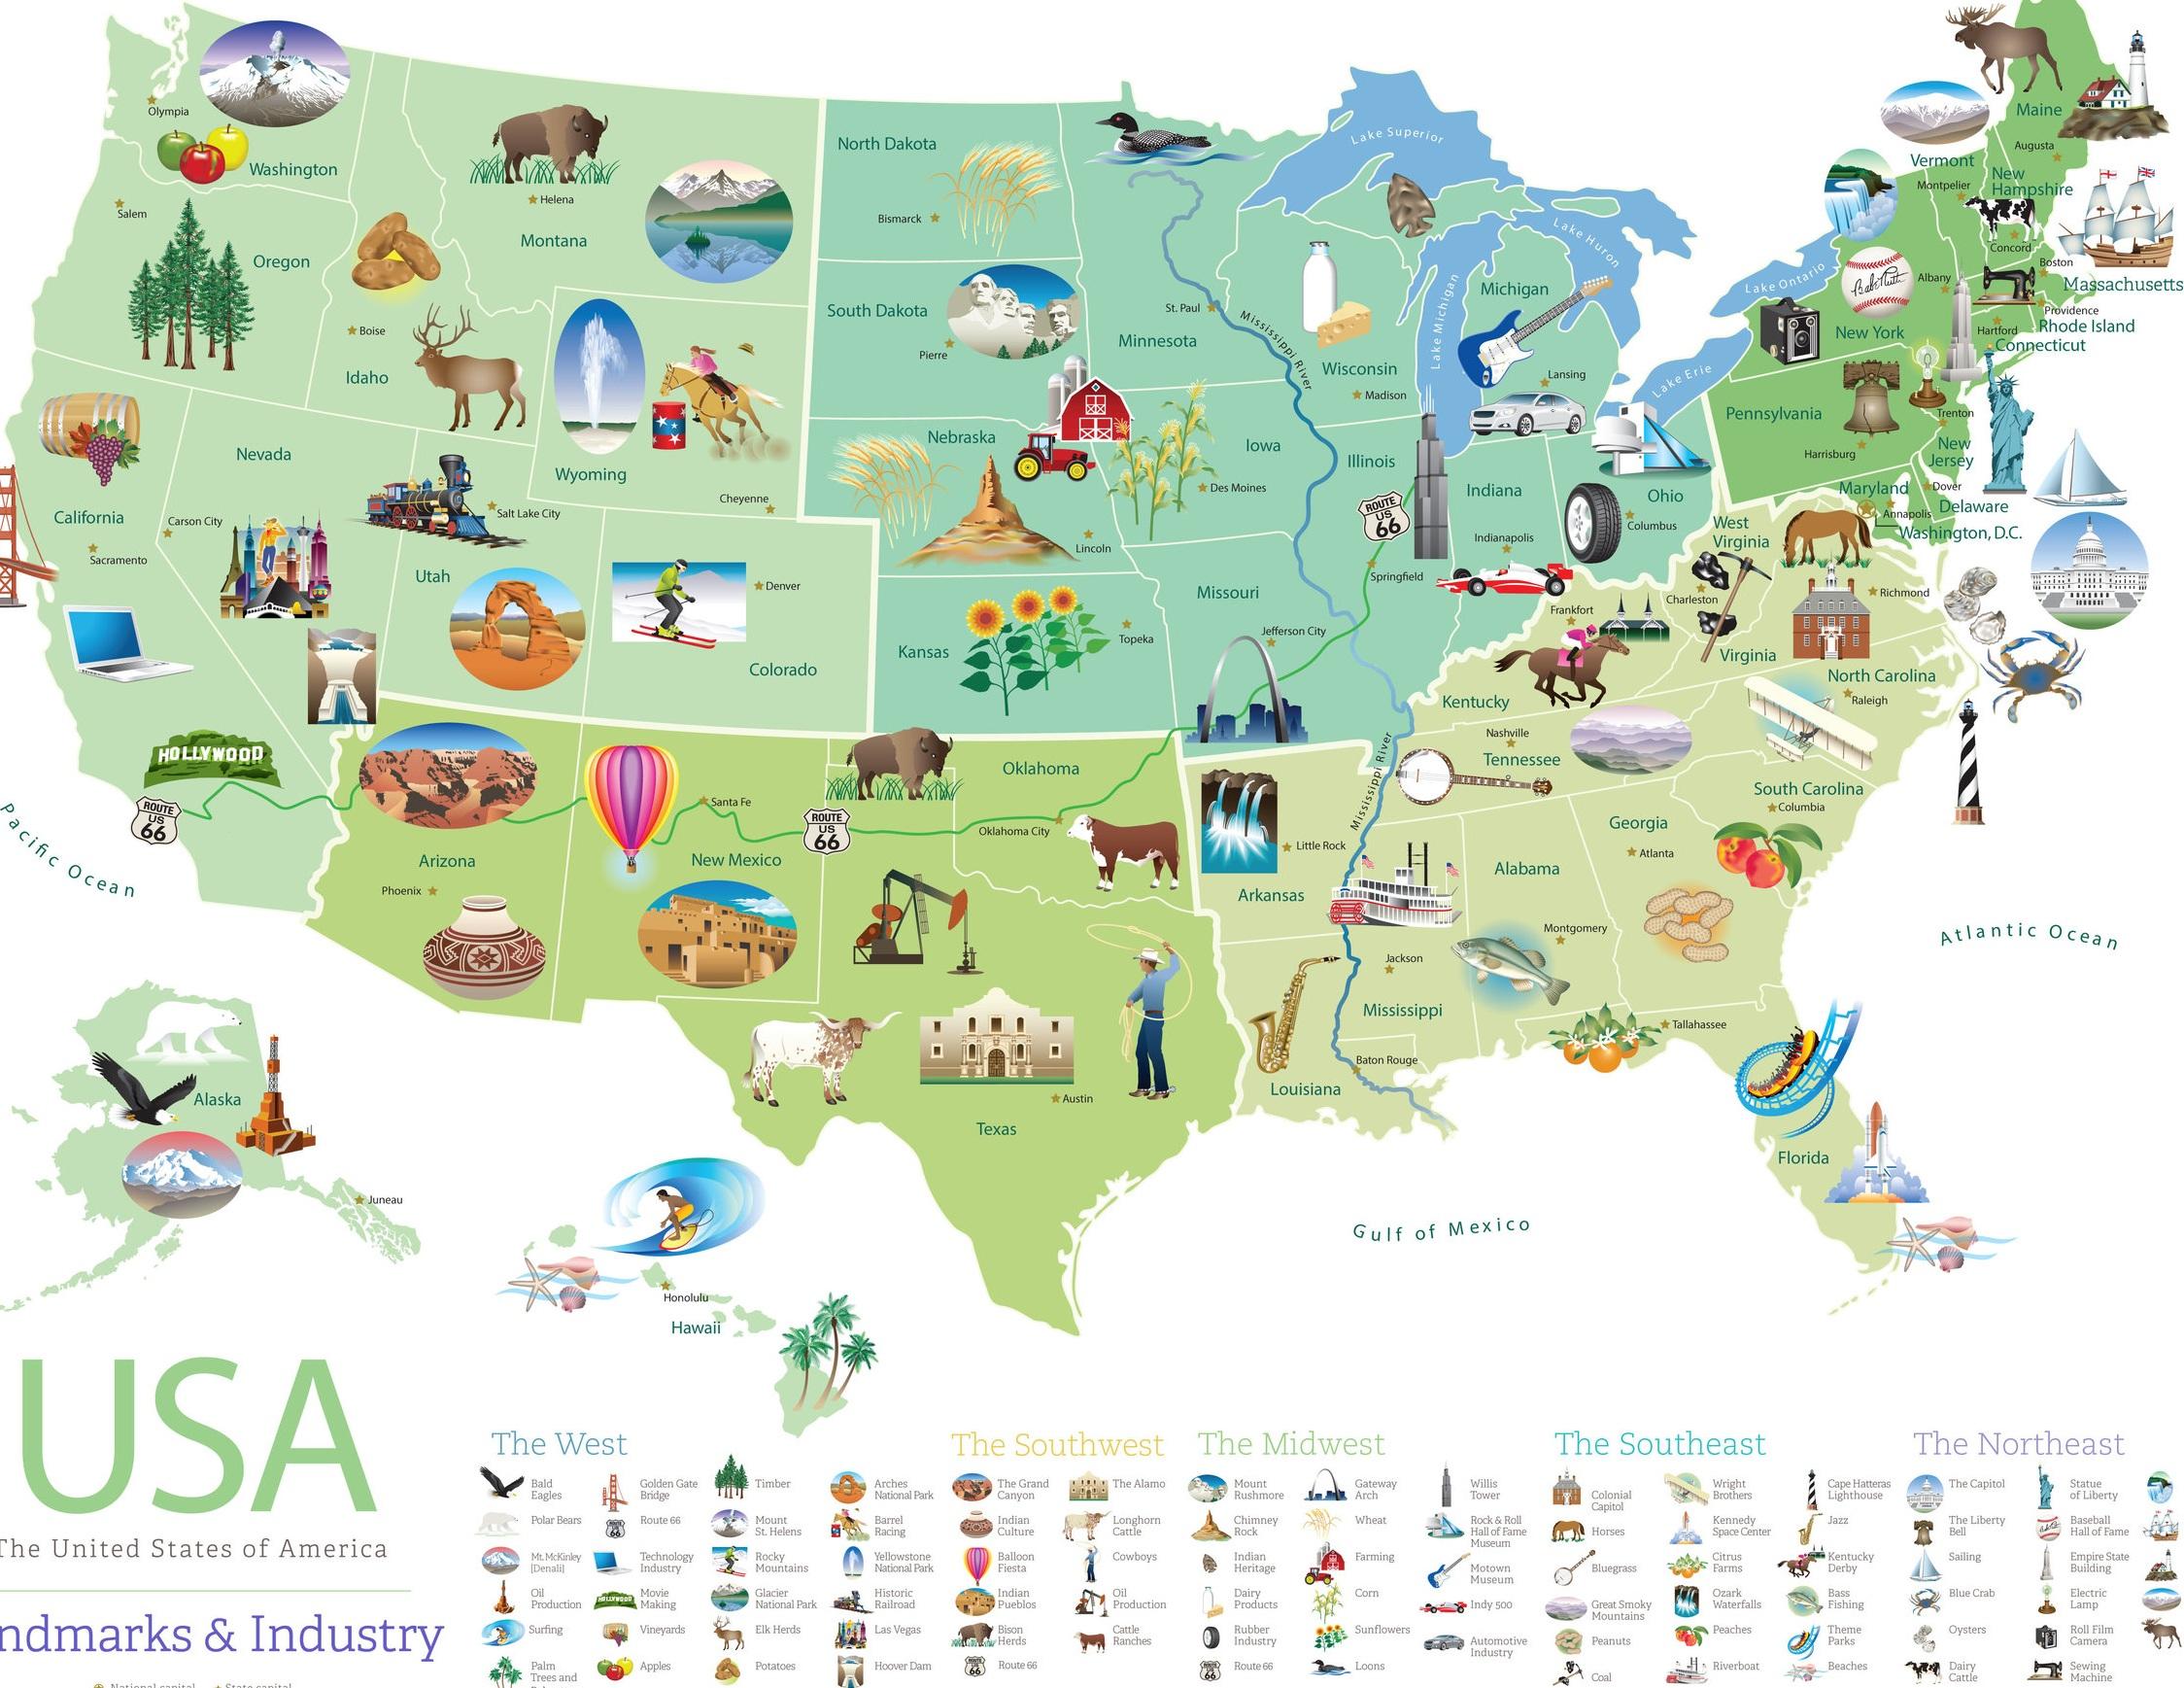 1302_USA_Maps_Landmarks_English-1.jpg